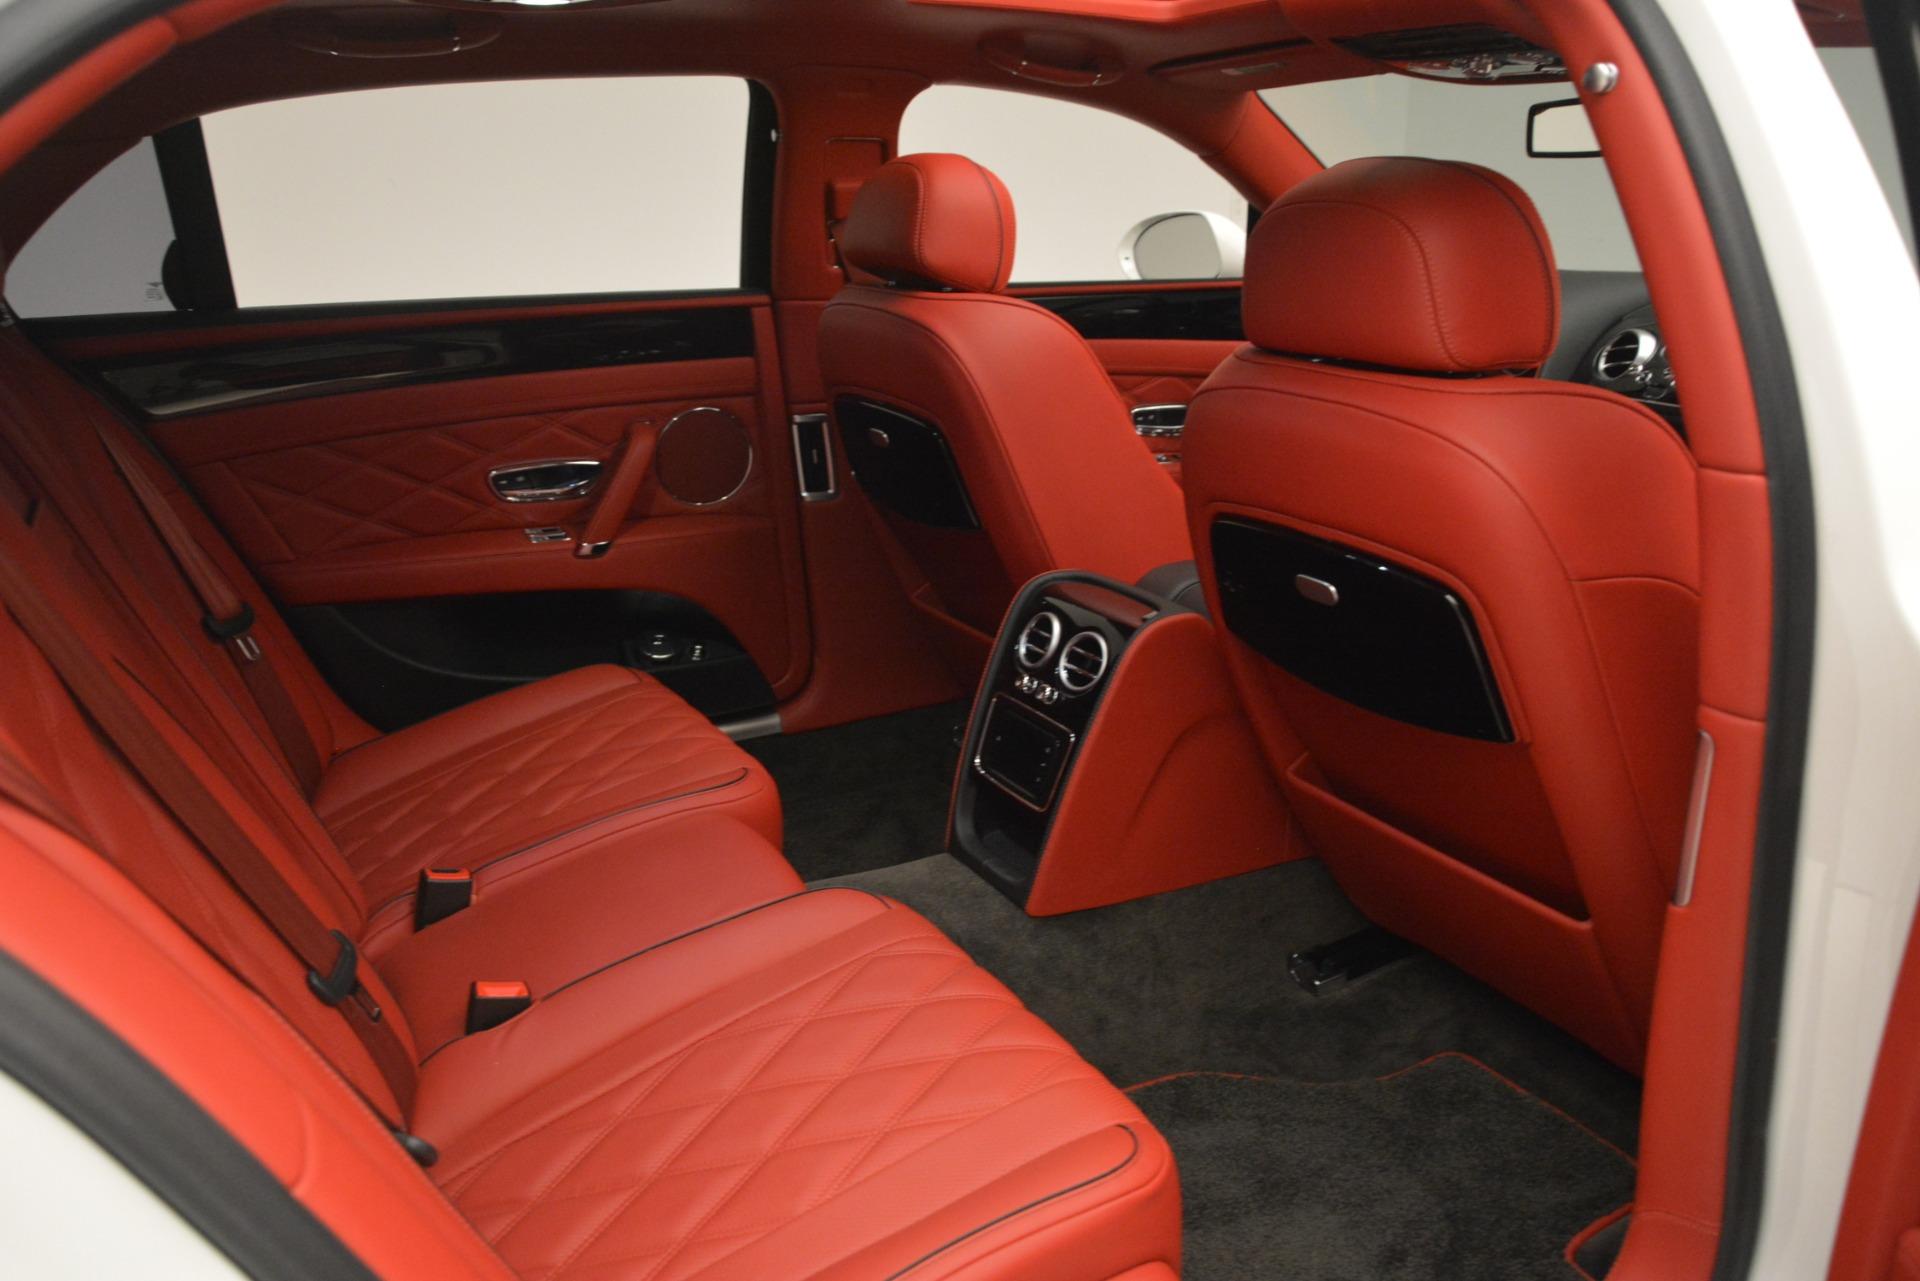 Used 2016 Bentley Flying Spur V8 For Sale In Westport, CT 3265_p25